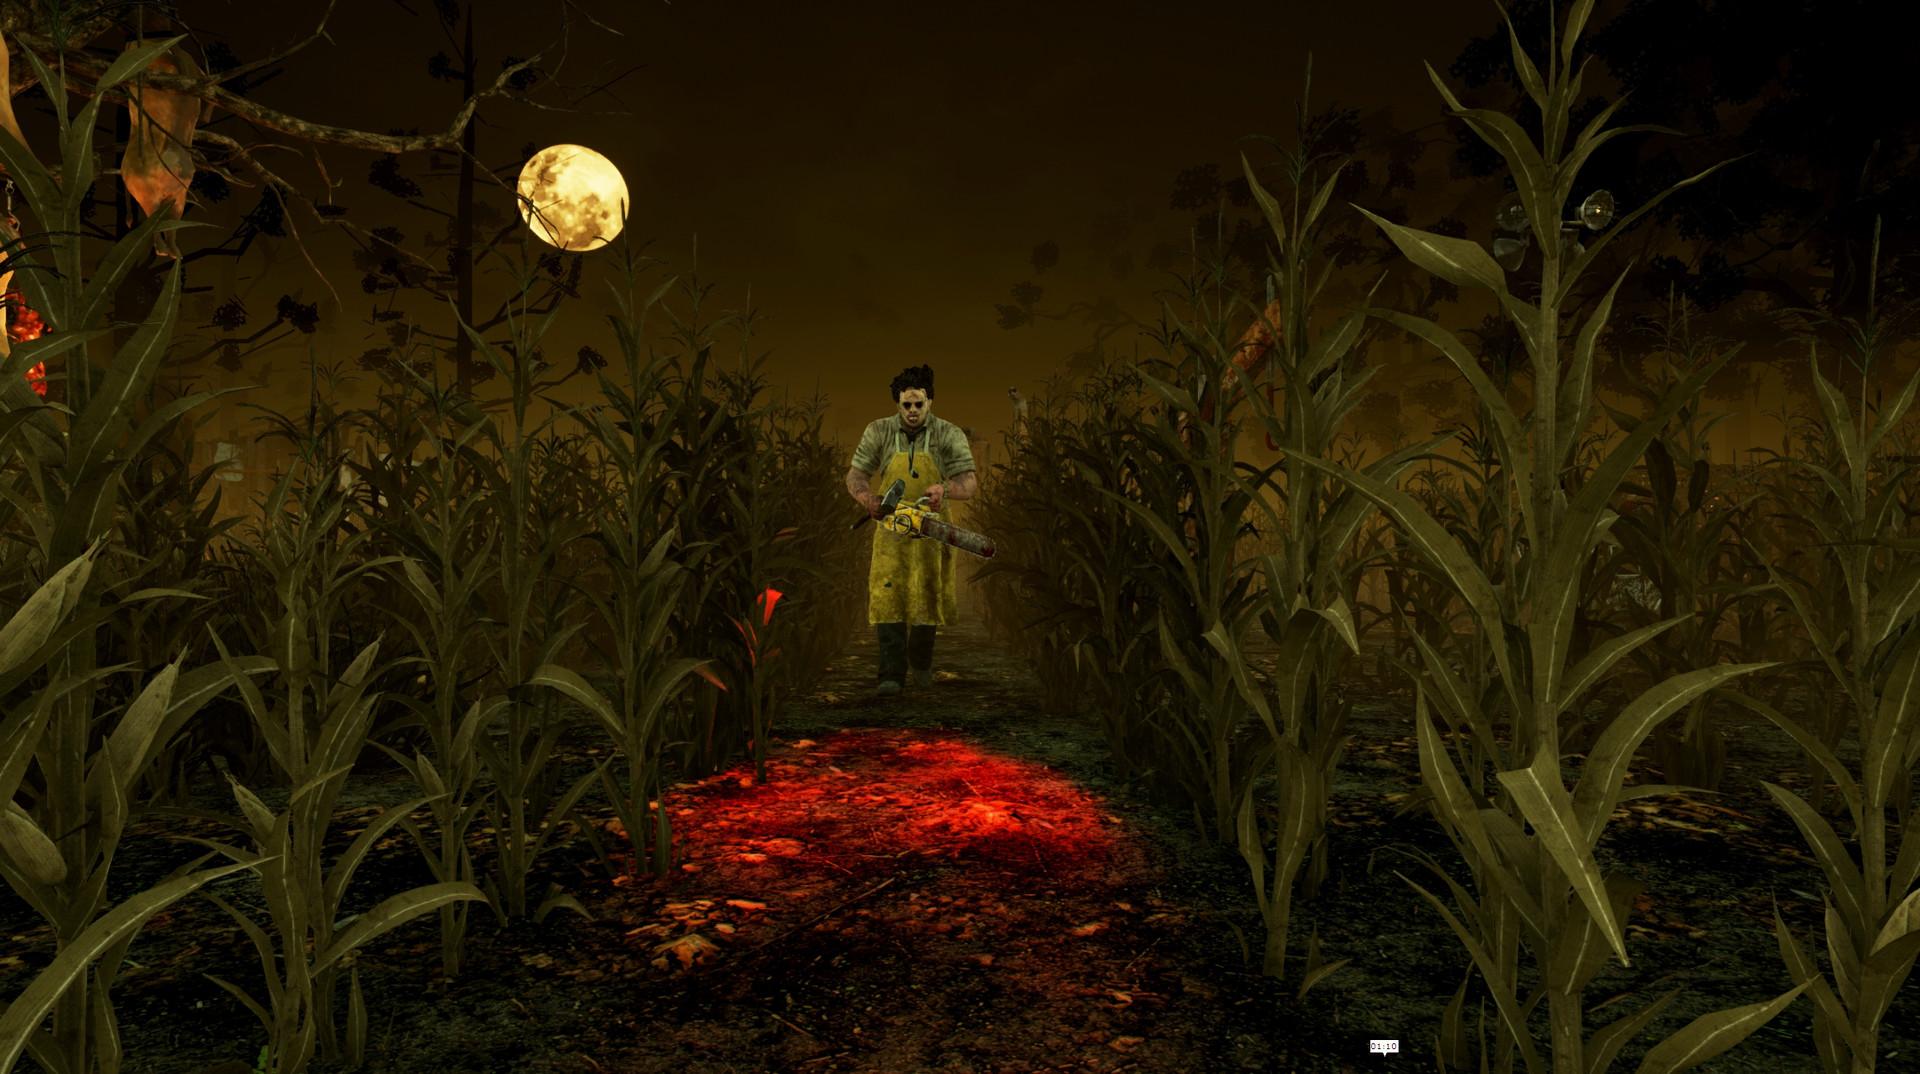 KHAiHOM.com - Dead by Daylight - Leatherface™